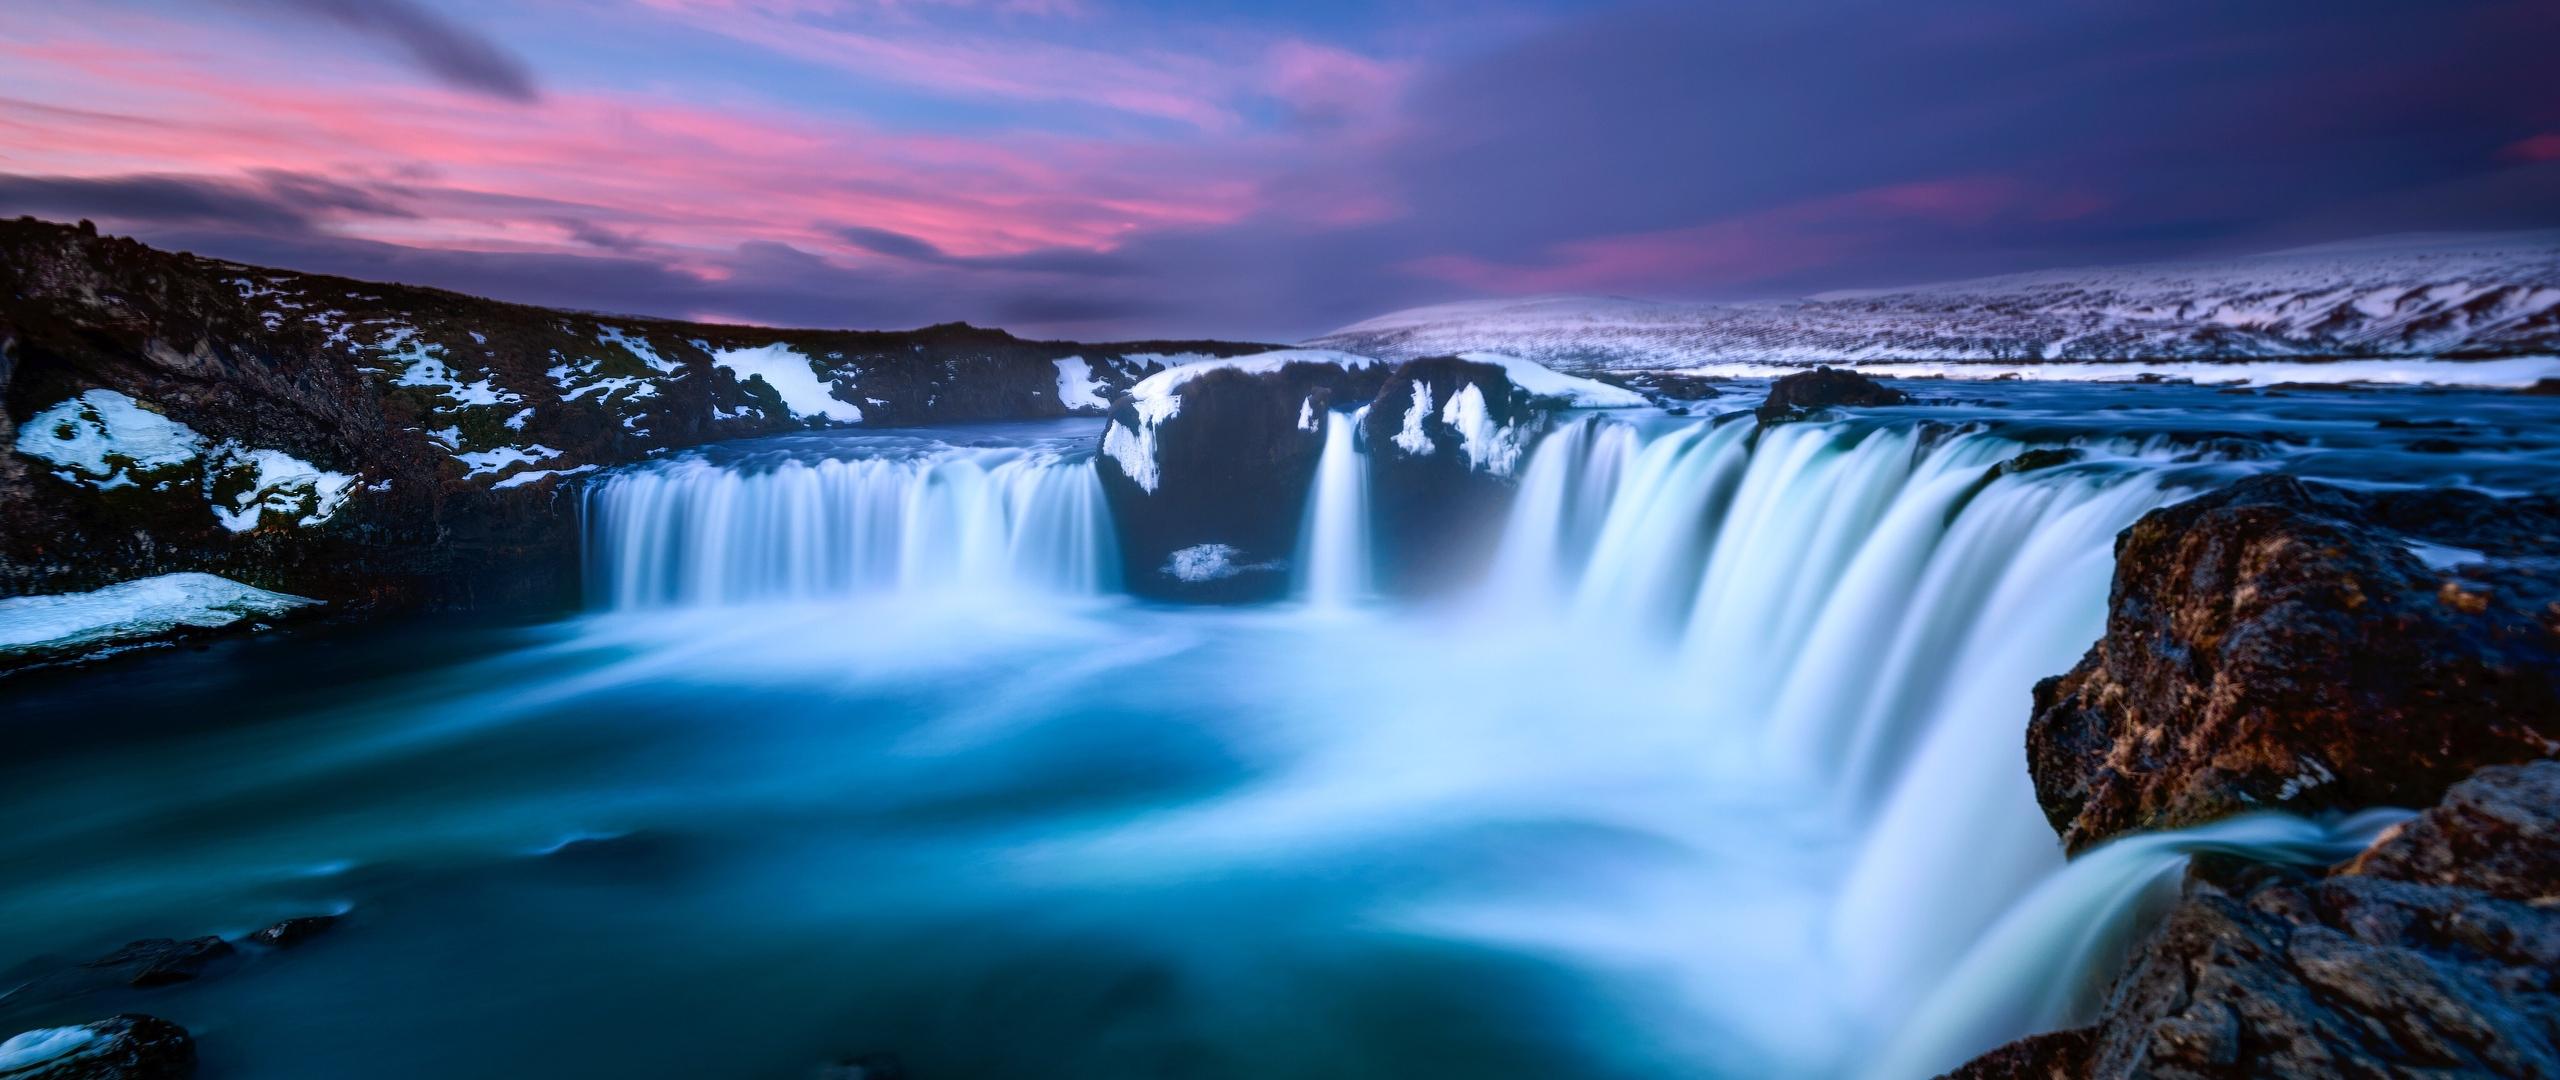 dreamy-waterfall-4k-sc.jpg